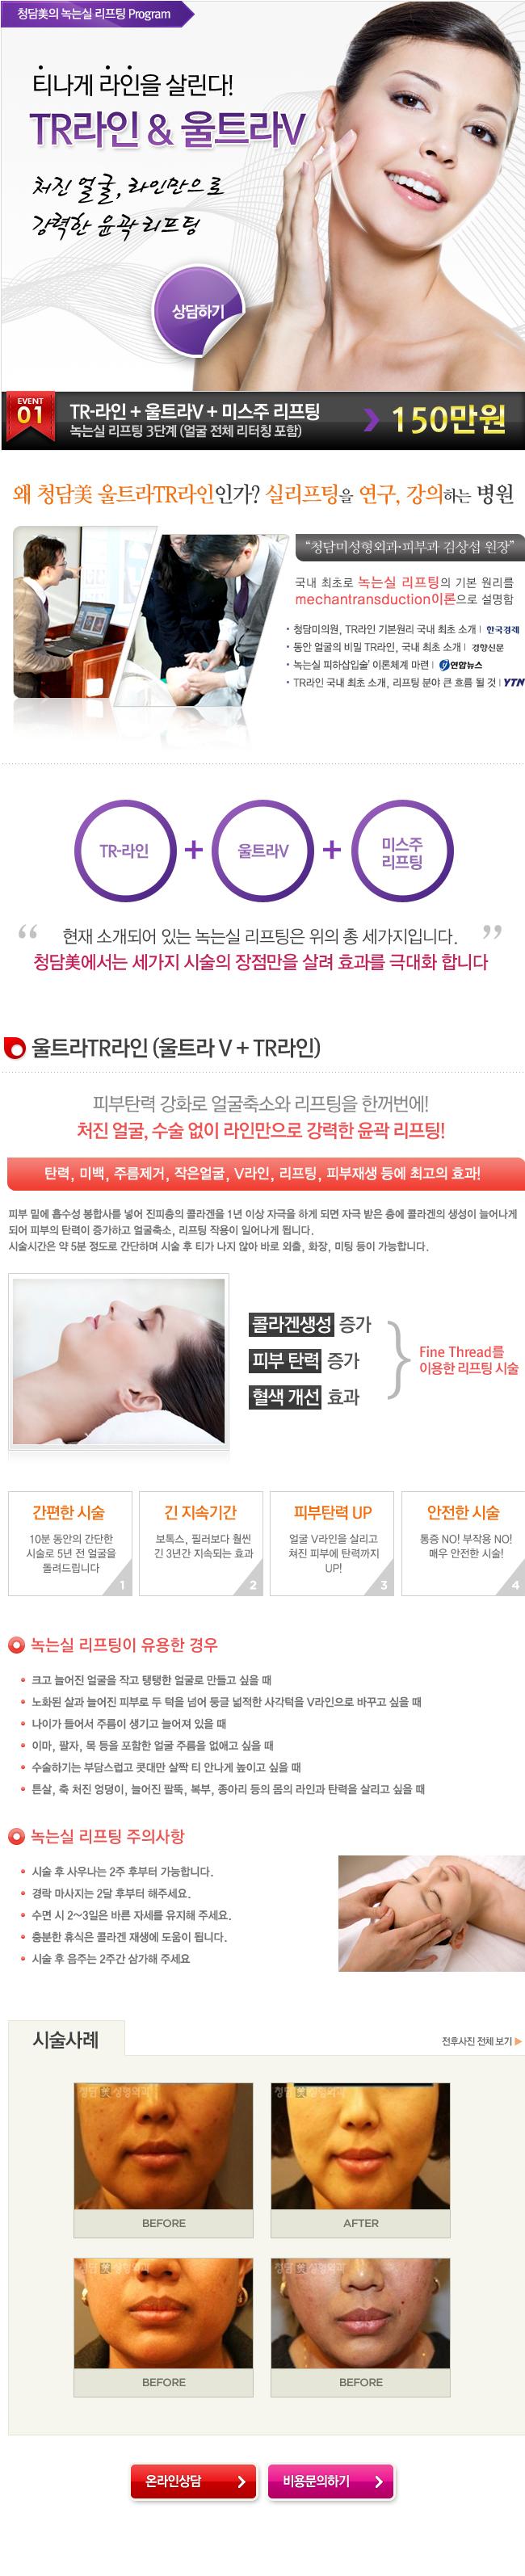 trline1.jpg